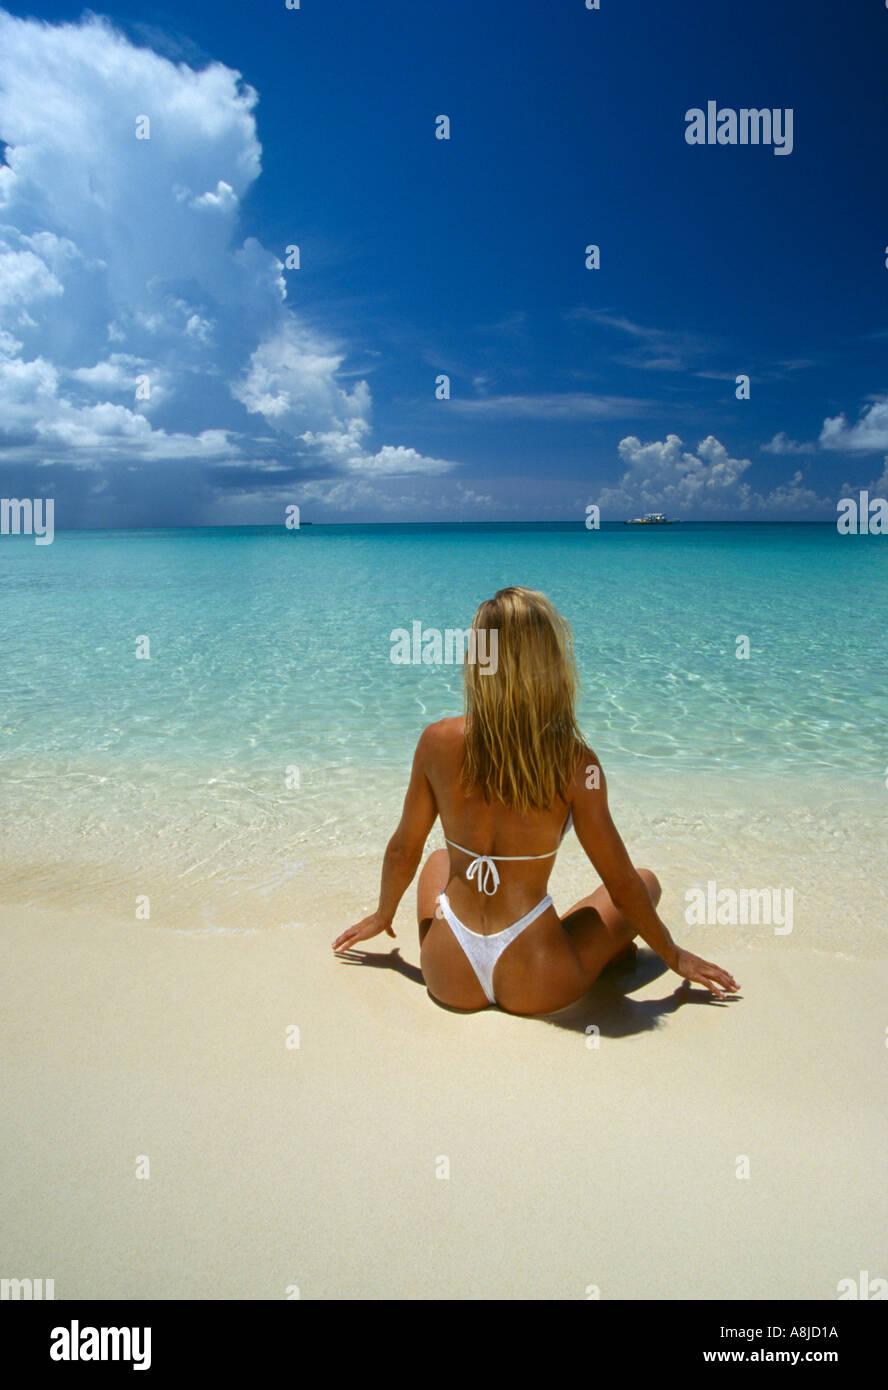 cayman islands women